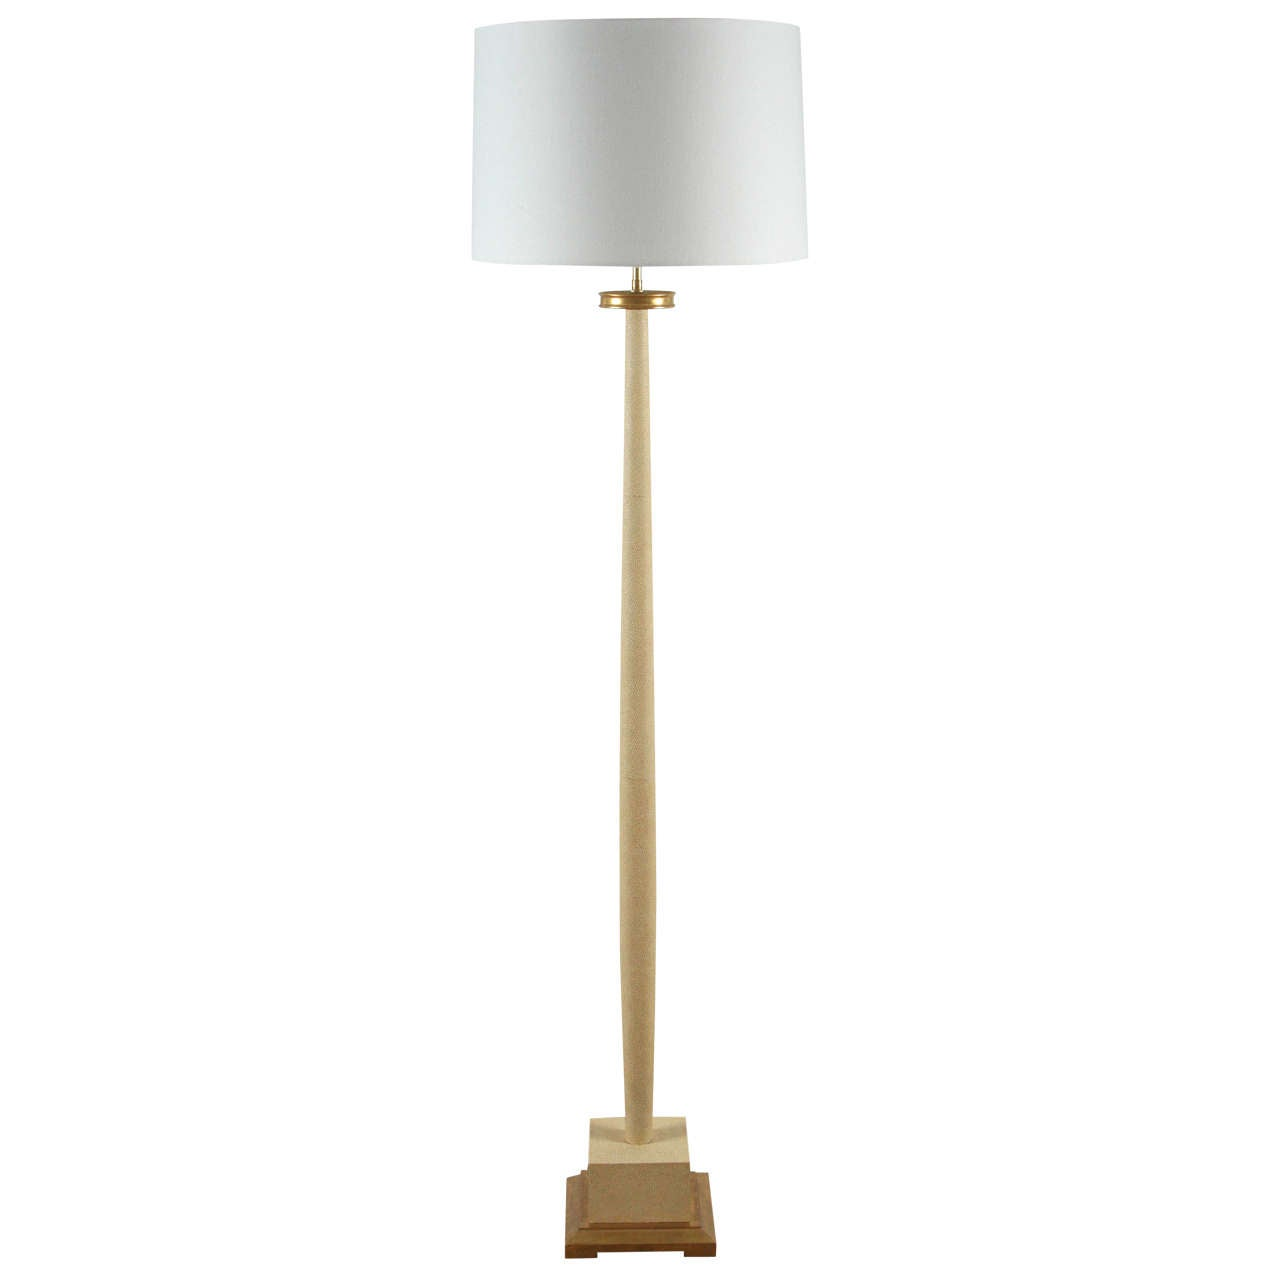 Paul marra faux shagreen floor lamp 1940s inspired cream for sale paul marra faux shagreen floor lamp 1940s inspired cream for sale aloadofball Gallery